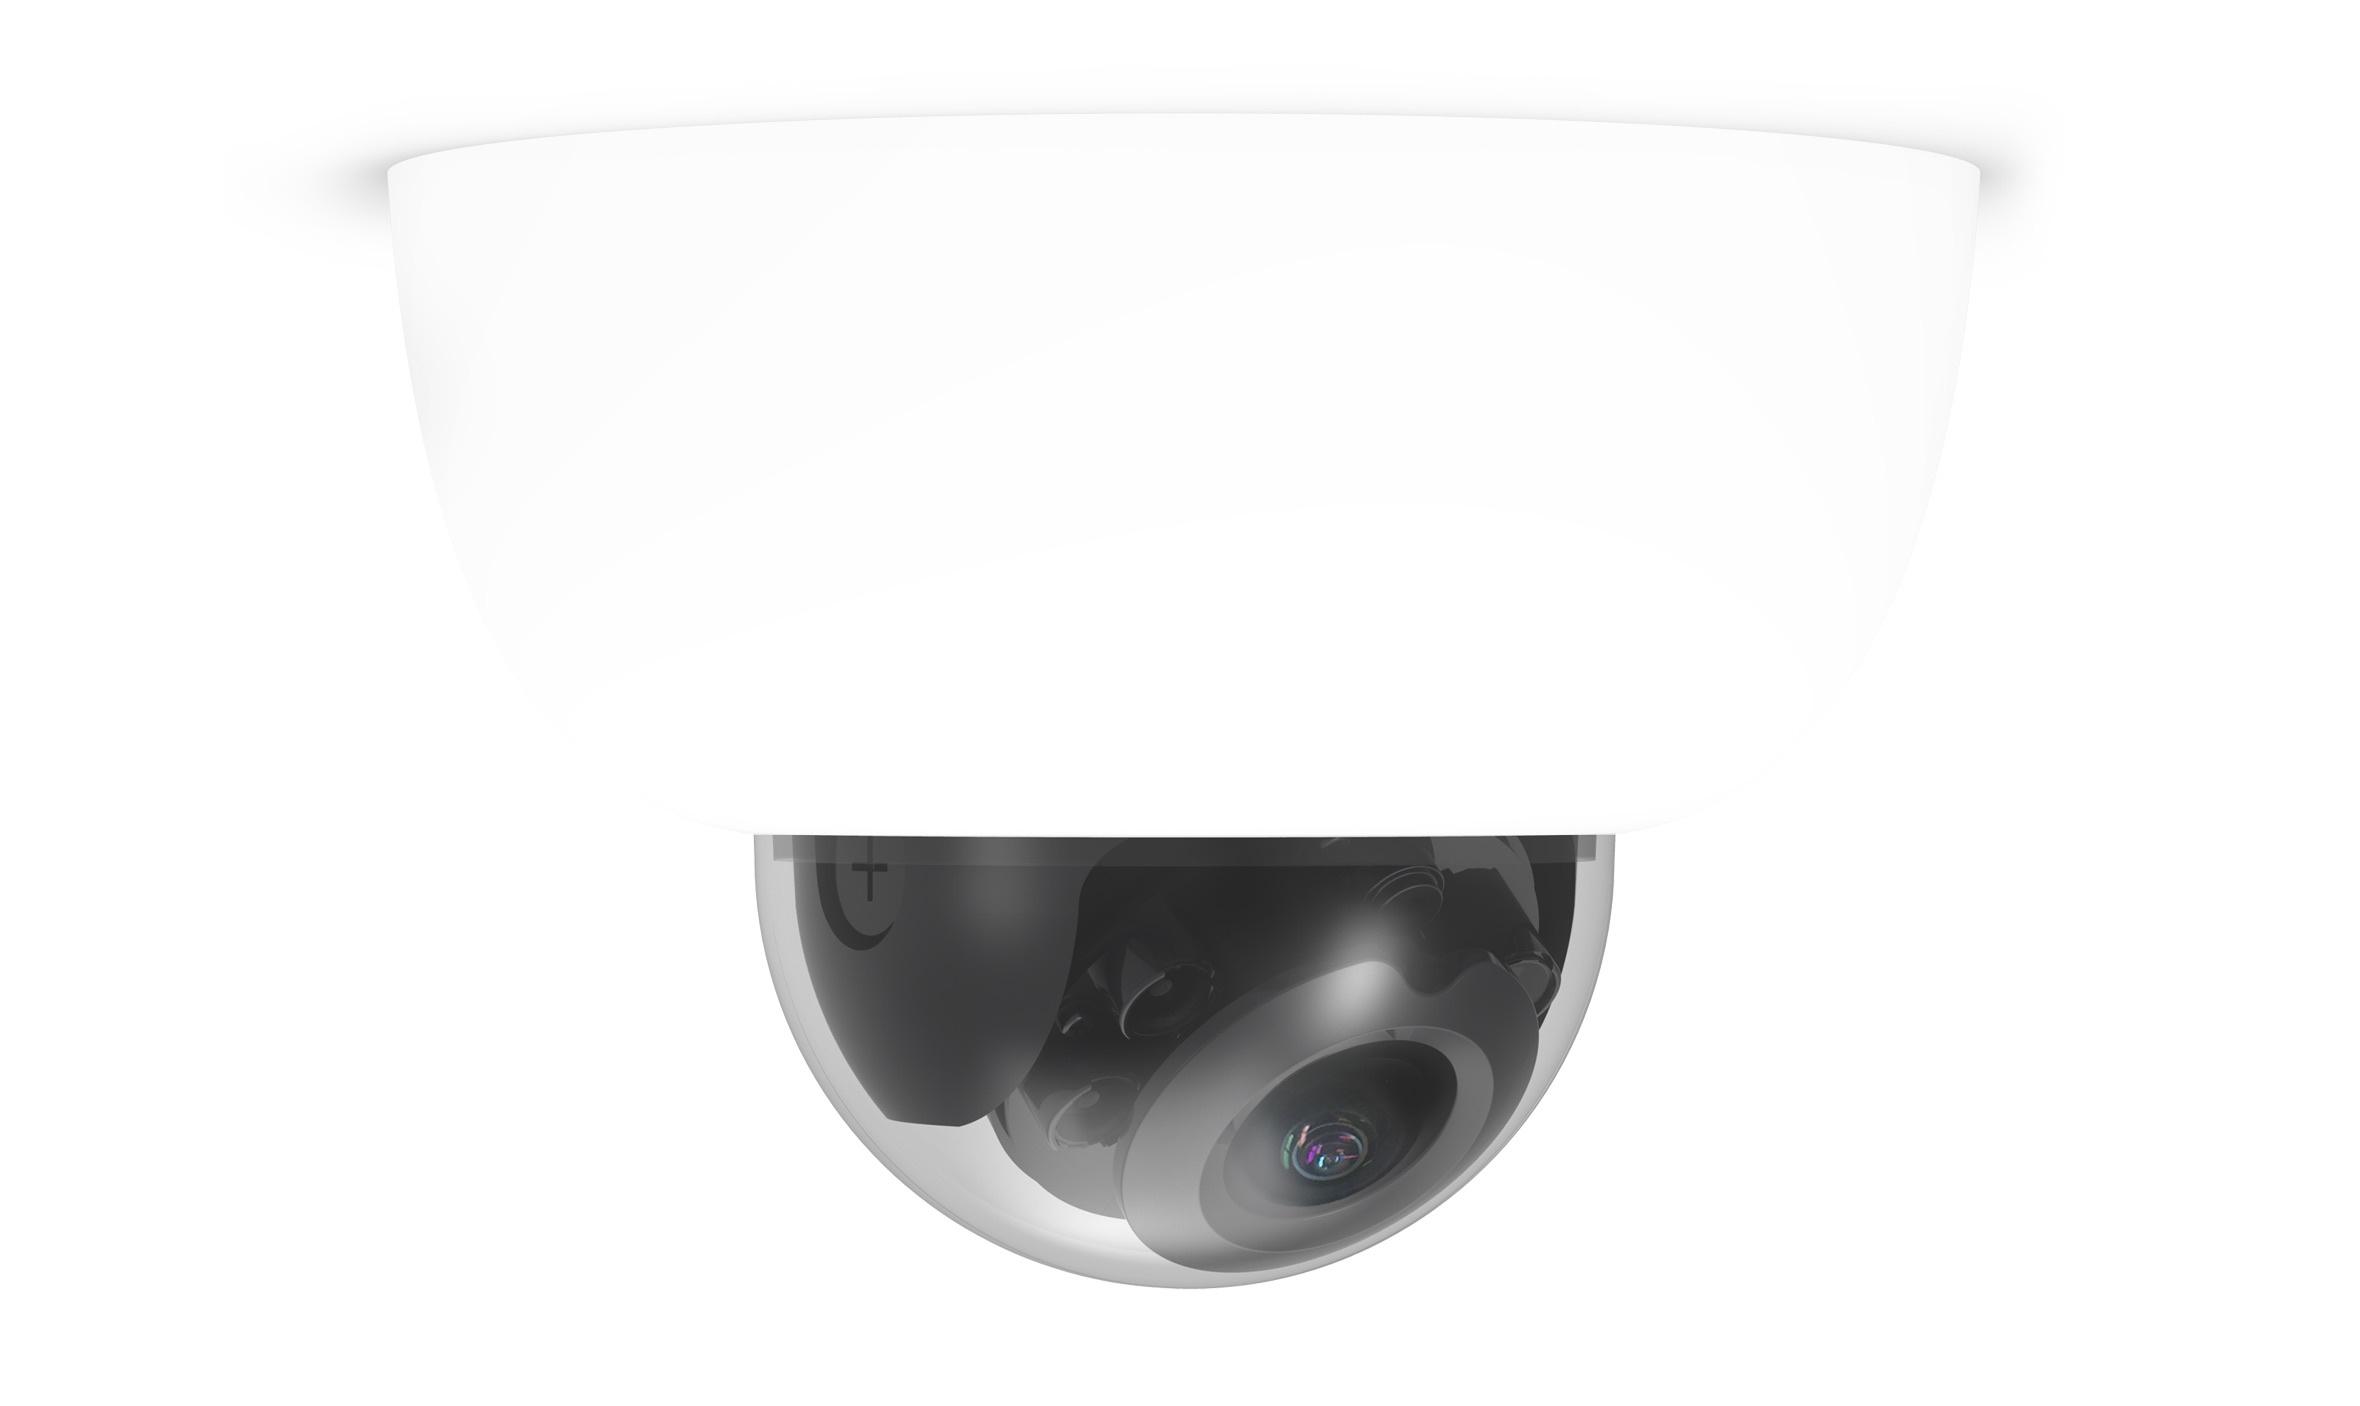 Meraki Security Cameras - partner with Matrix Networks for an enhanced Meraki environment